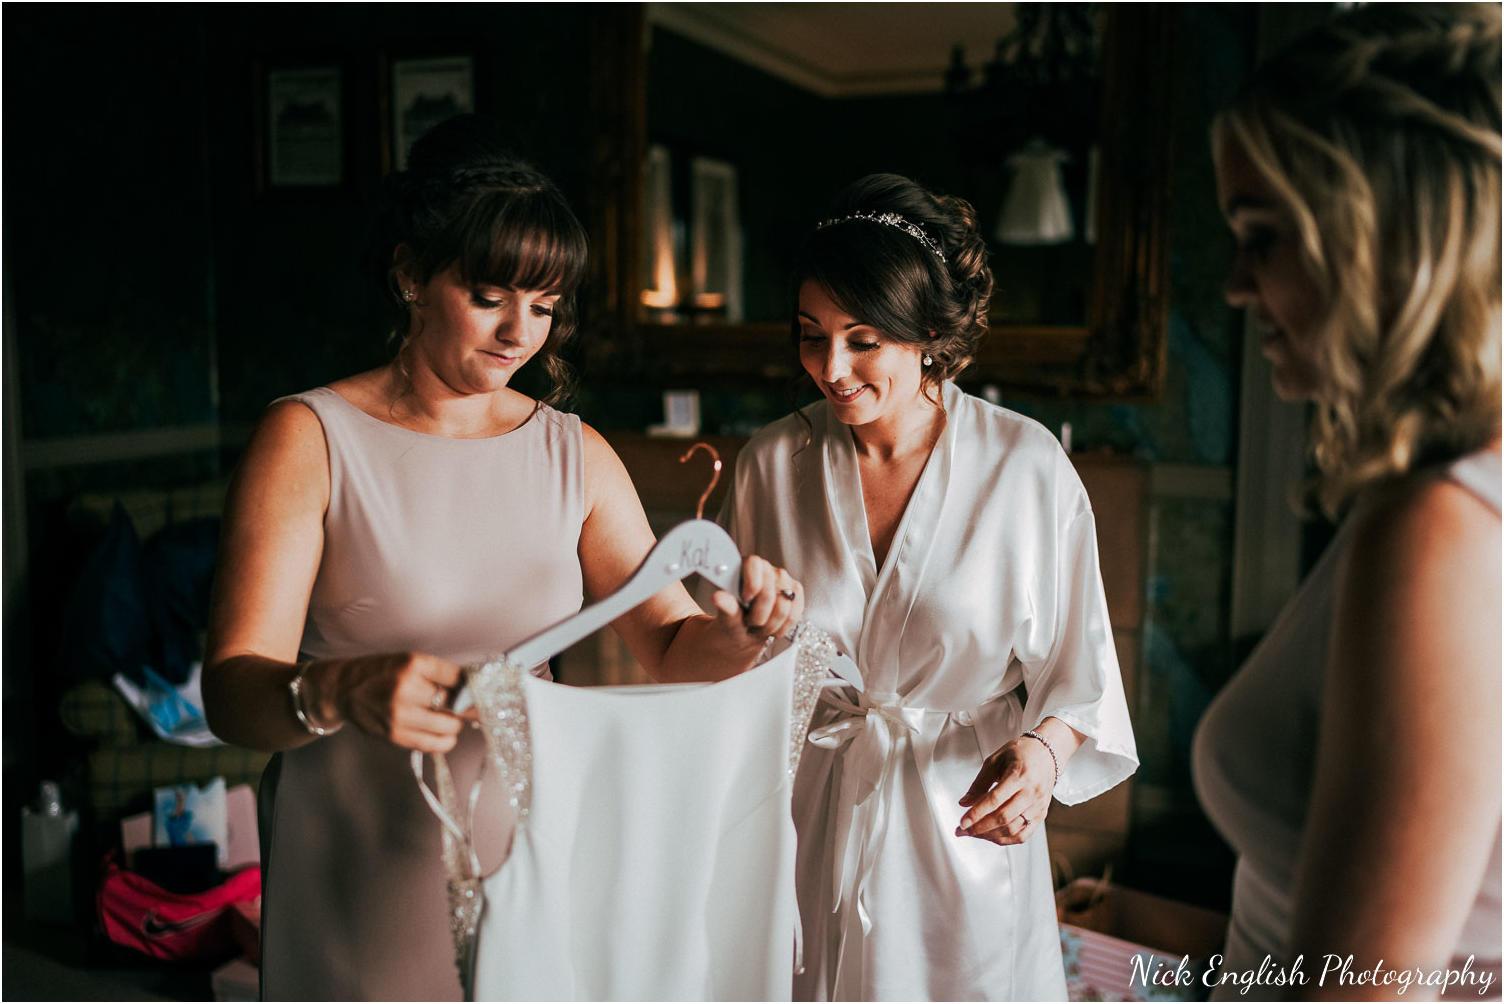 Mitton_Hall_Wedding_Summer_Photograph-24.jpg